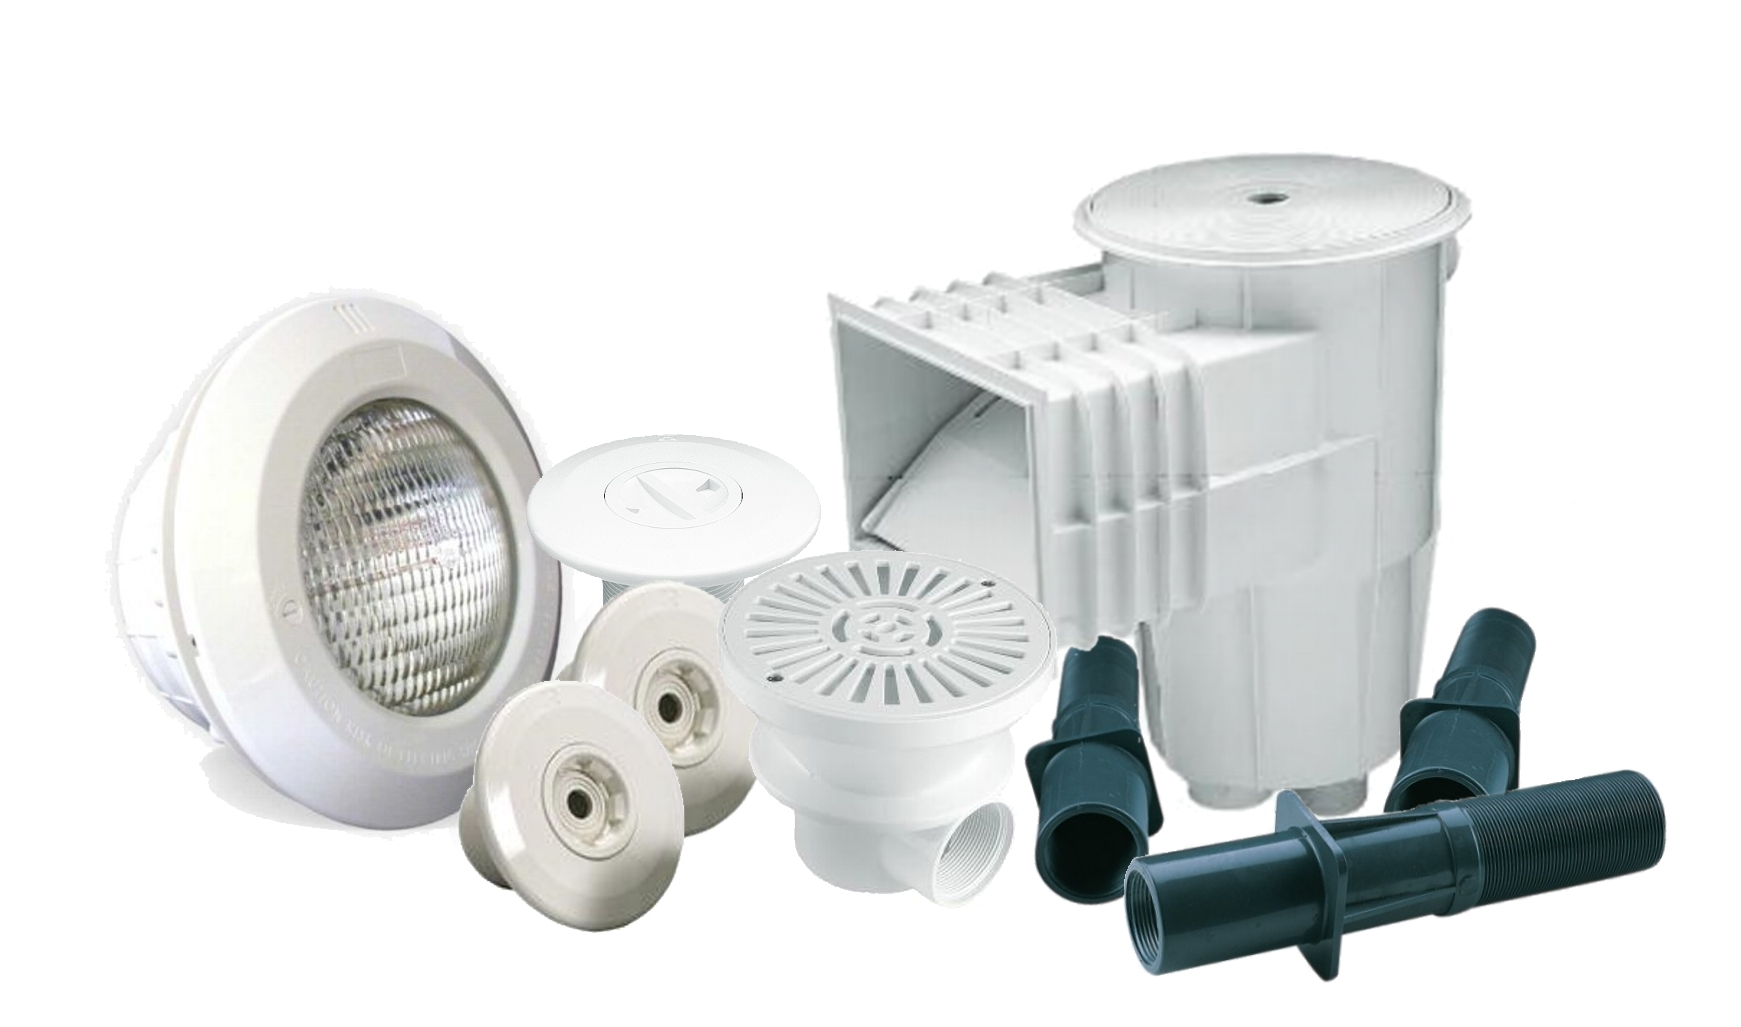 Piscinas material vaso pack construccion piscina 1 skimmer boquillas sumidero foco - Boquillas de impulsion para piscinas ...